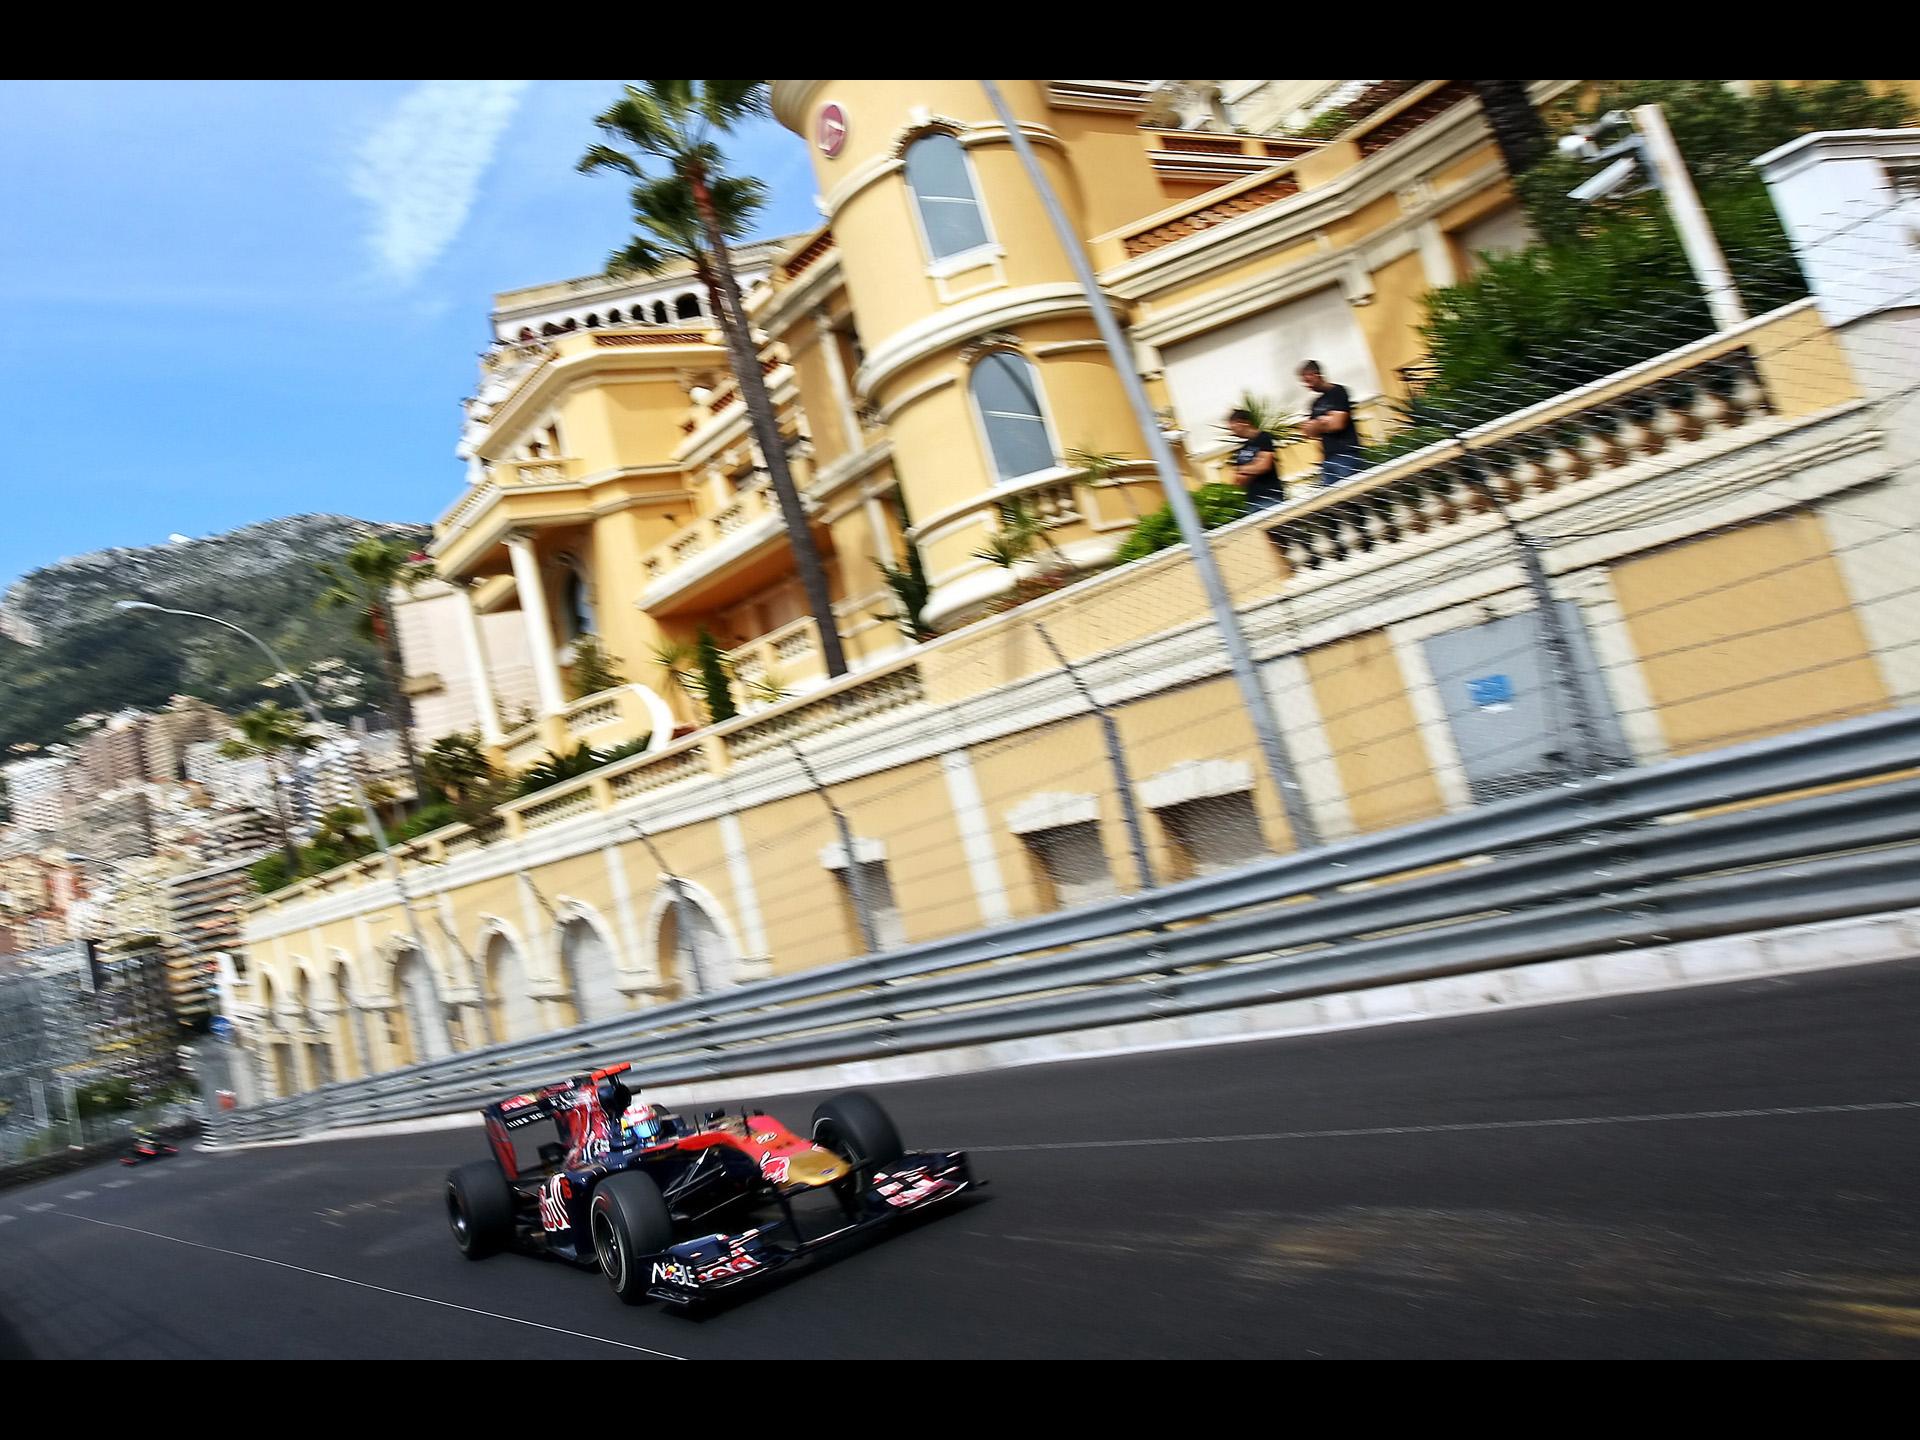 50 Monaco Grand Prix Wallpaper On Wallpapersafari